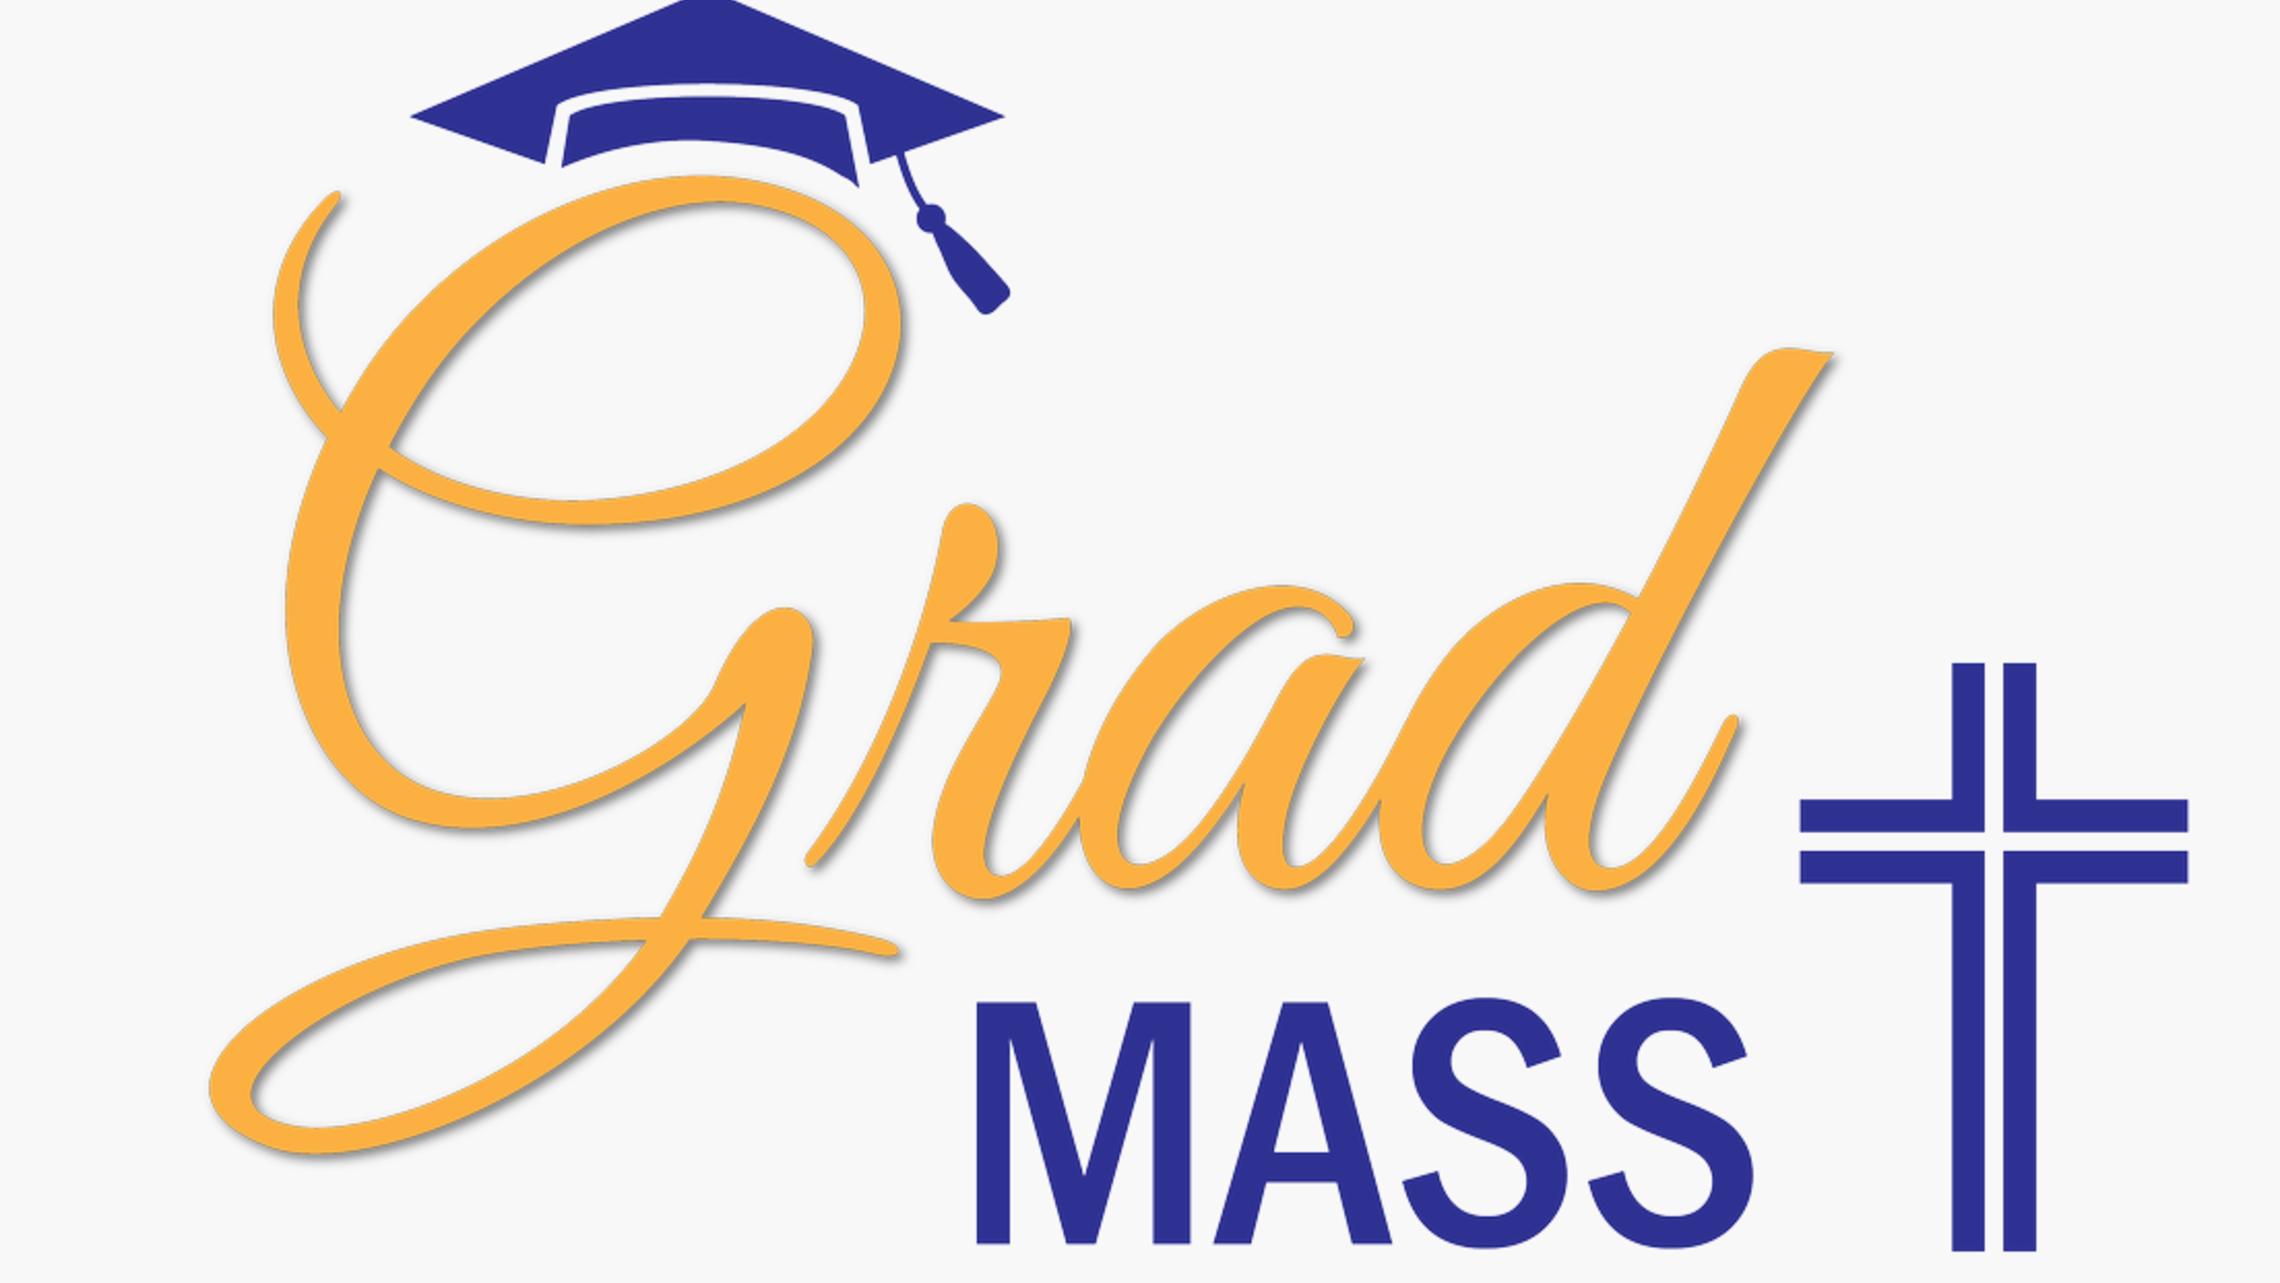 Gradmass2019